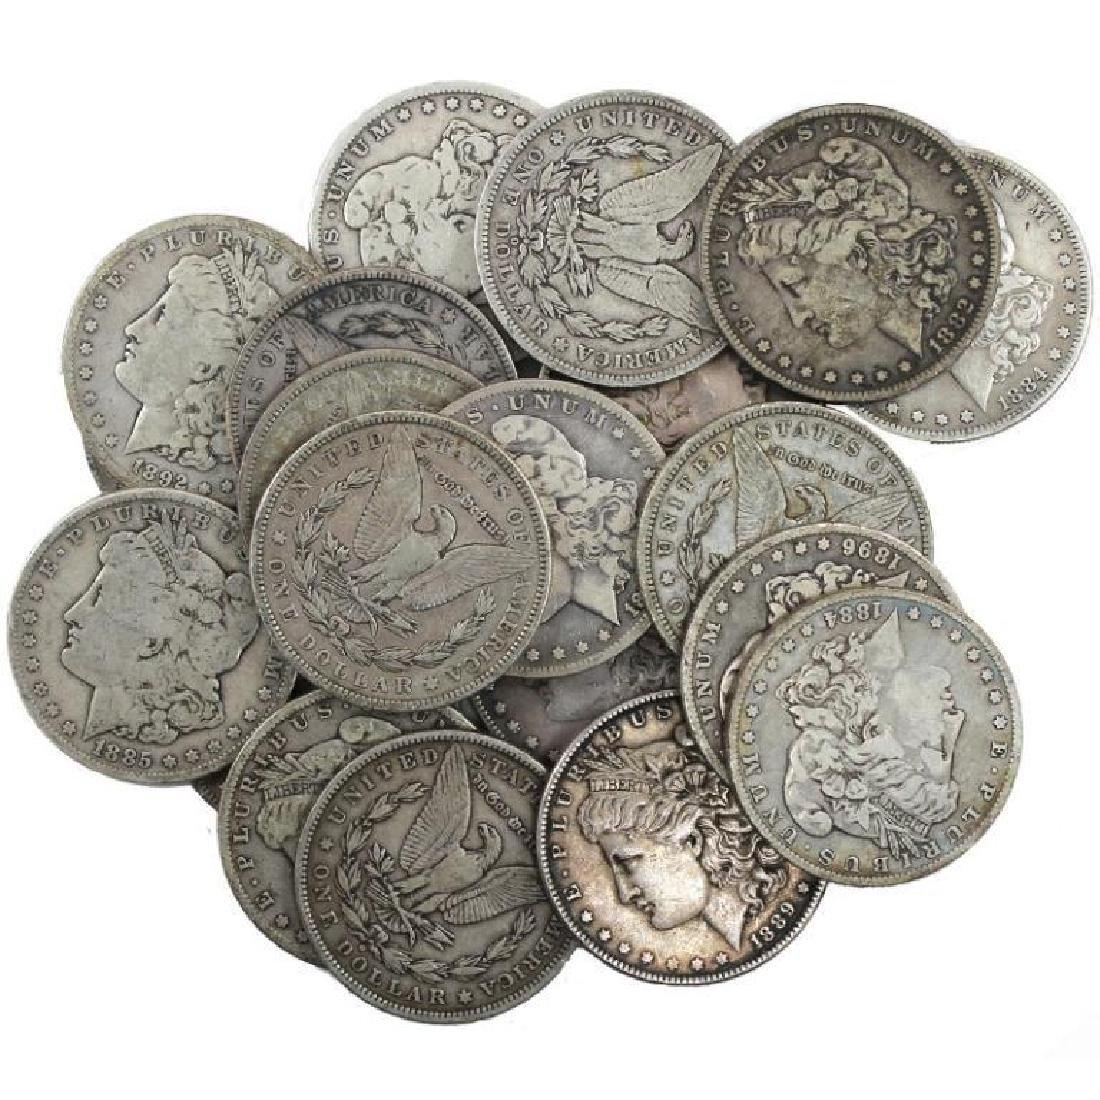 Lot of (20) Random Date Morgan Silver Dollars